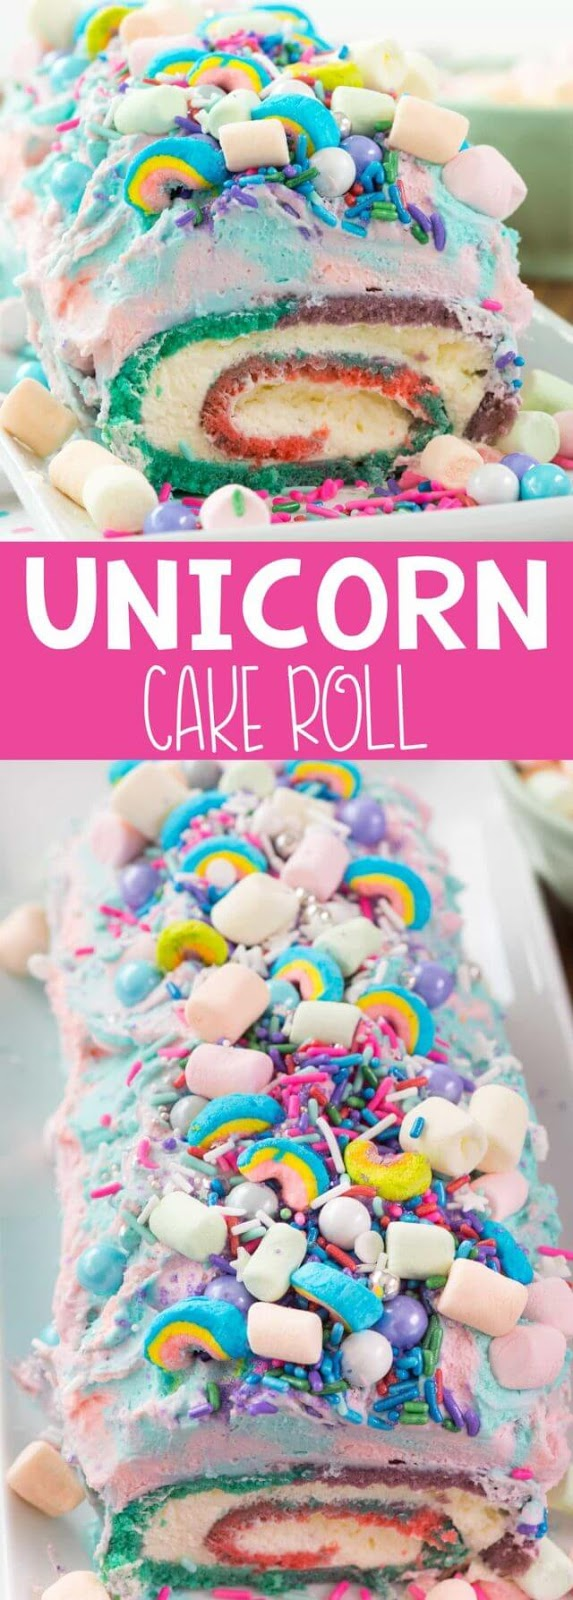 Unicorn Cake Roll